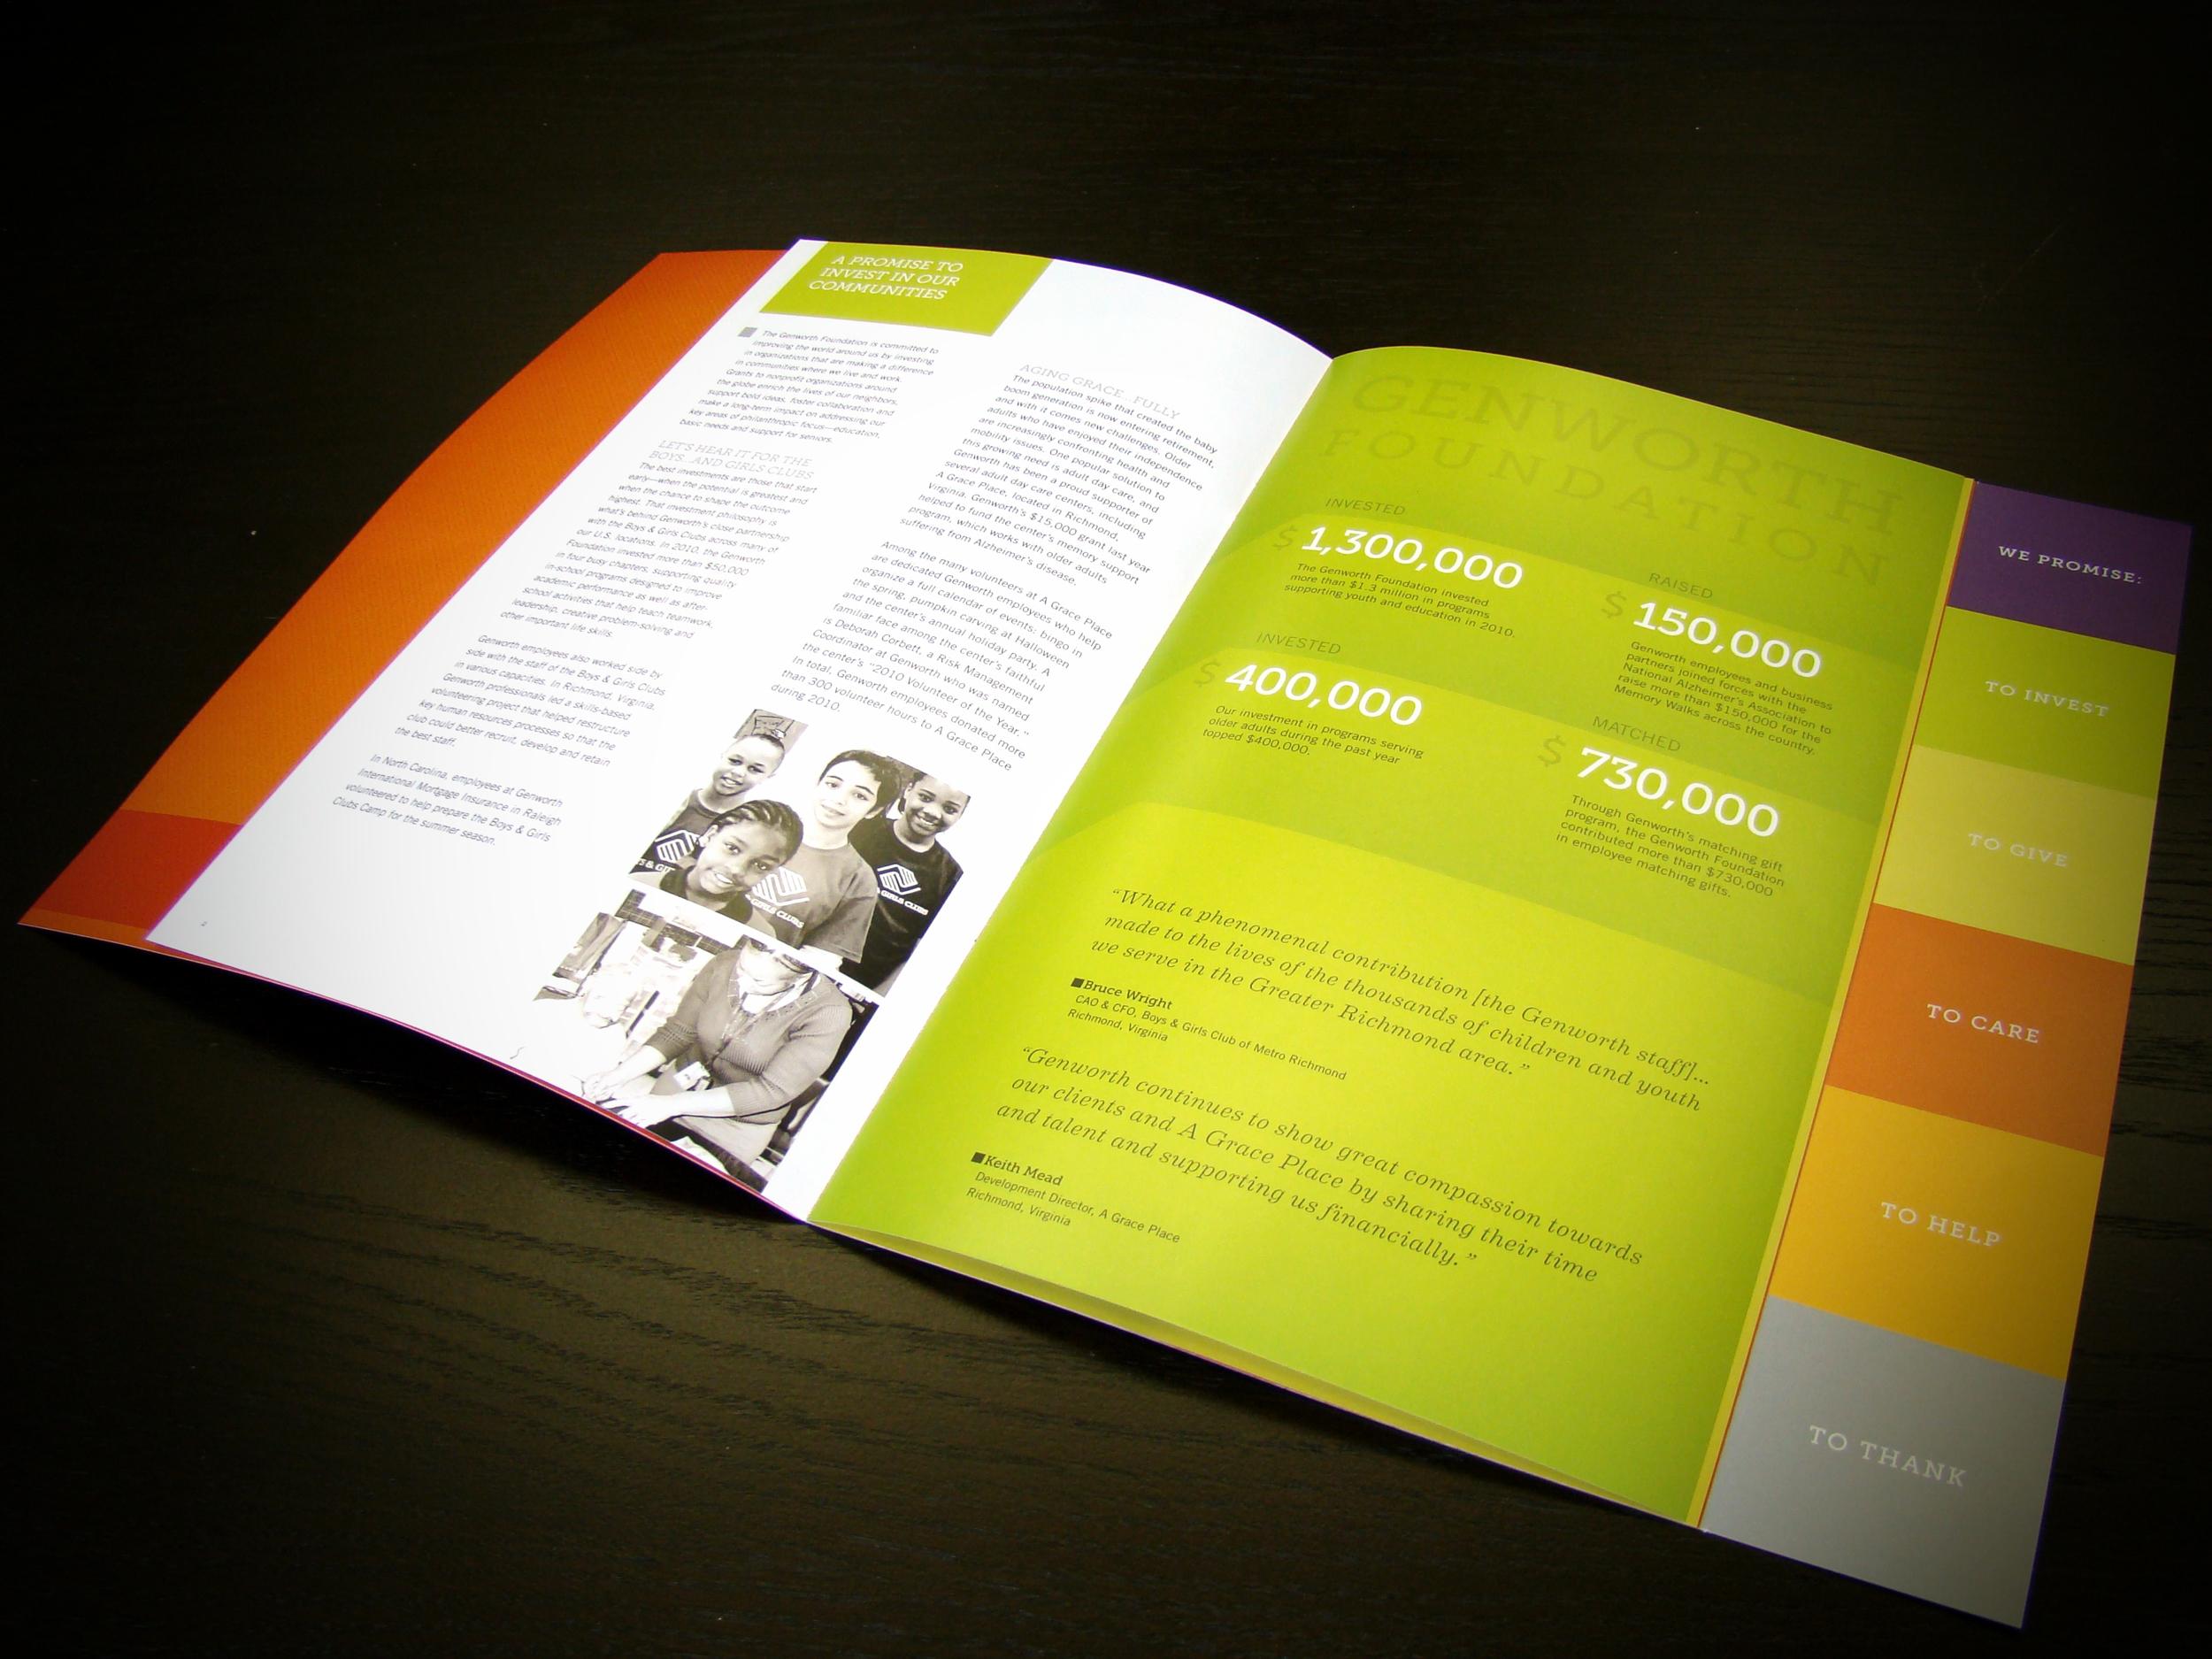 Genworth Foundation Annual Report Interior Spread